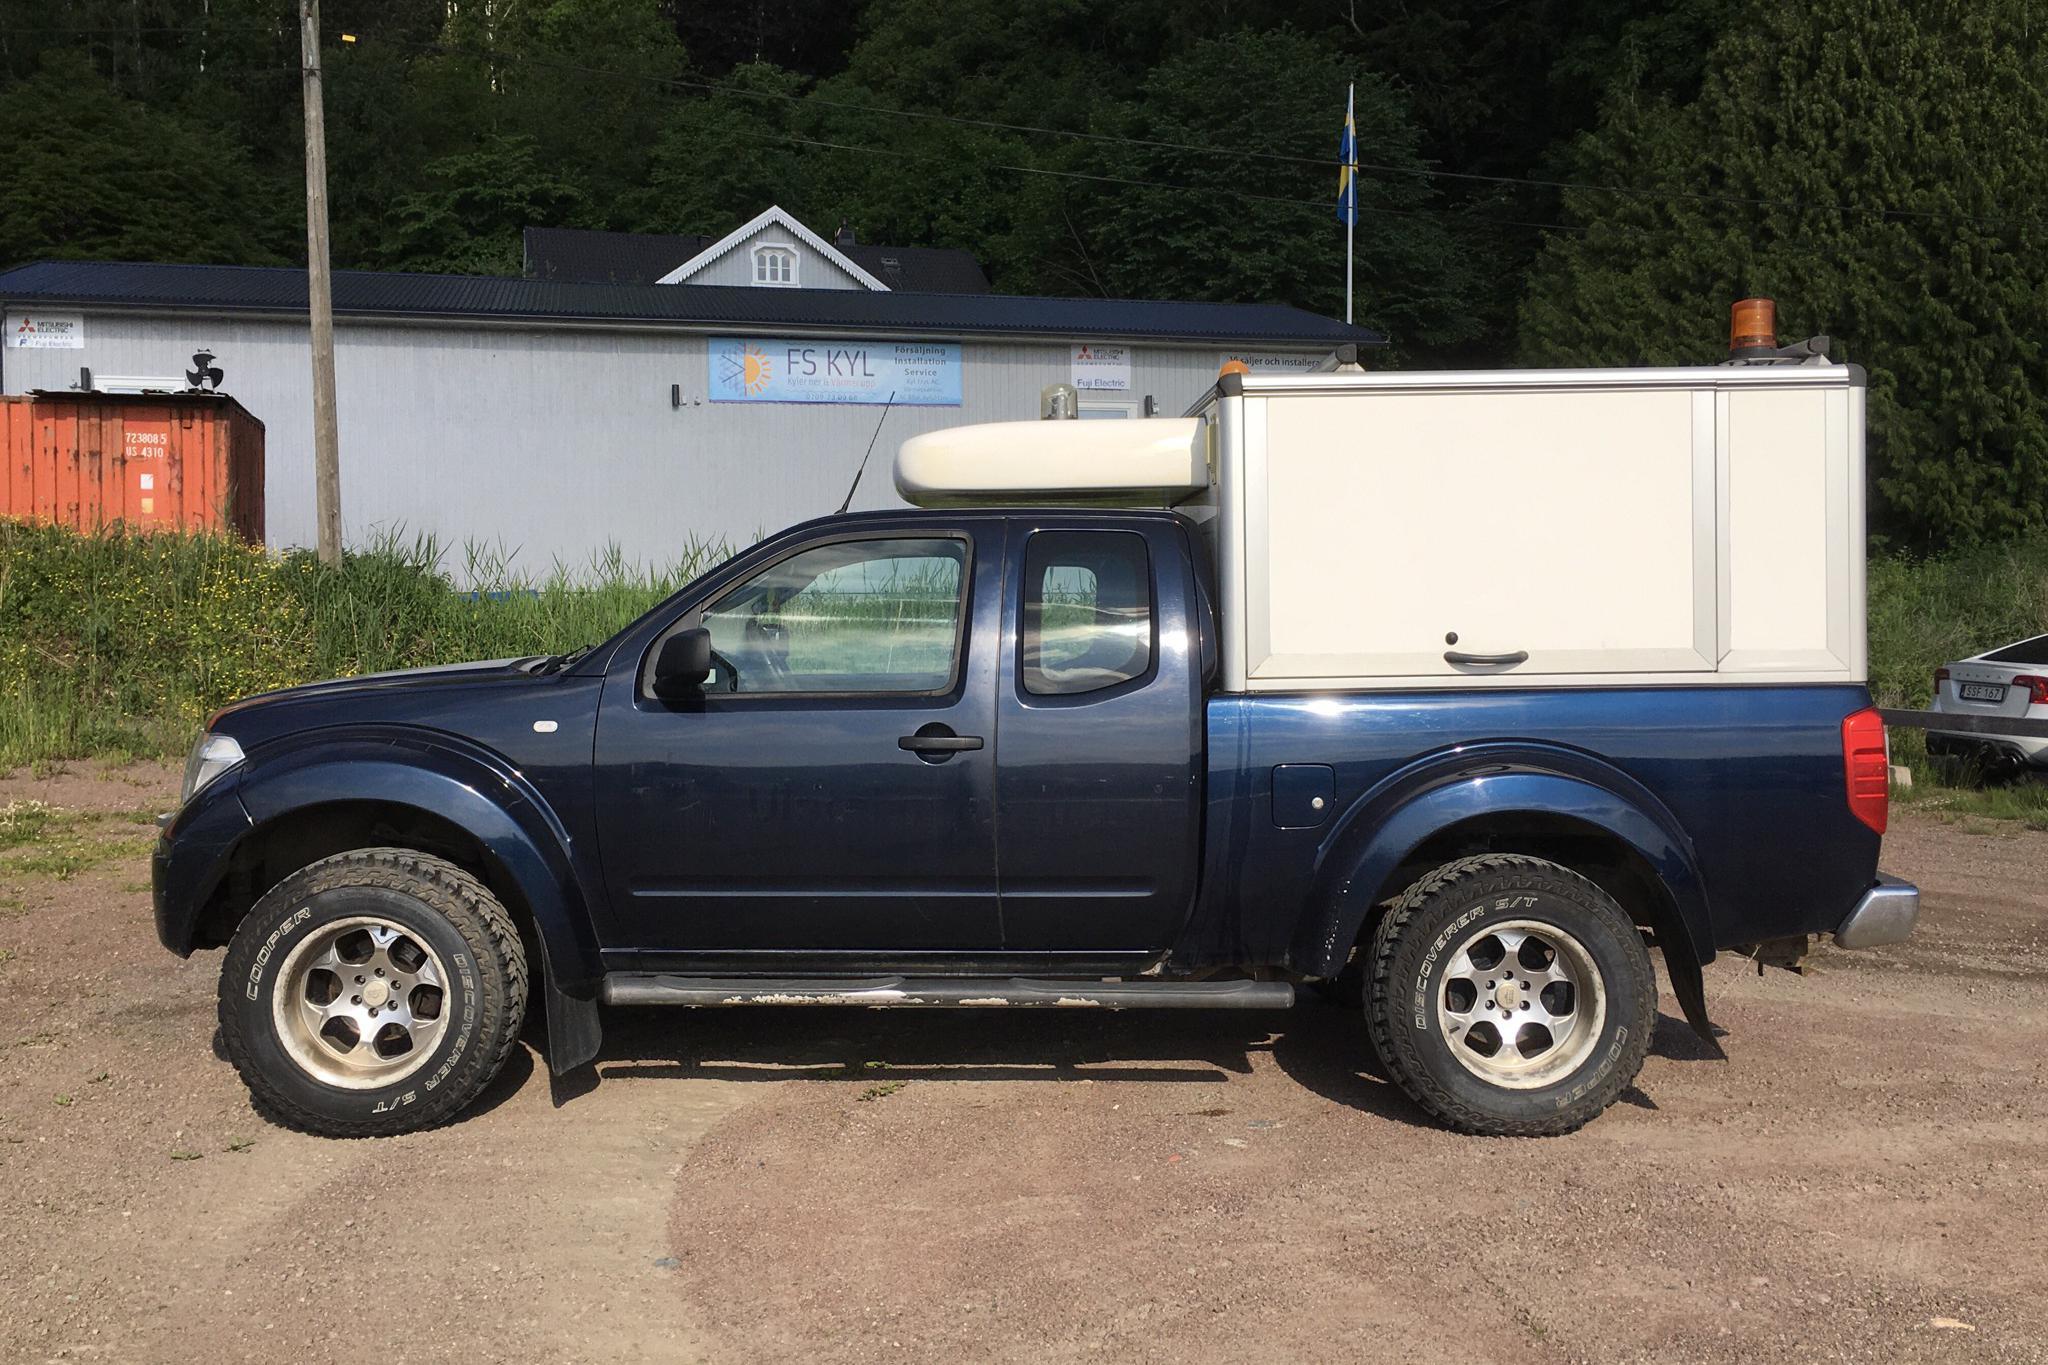 Nissan Navara 2.5 dCi 4WD (174hk) - 18 170 mil - Manuell - Dark Blue - 2007